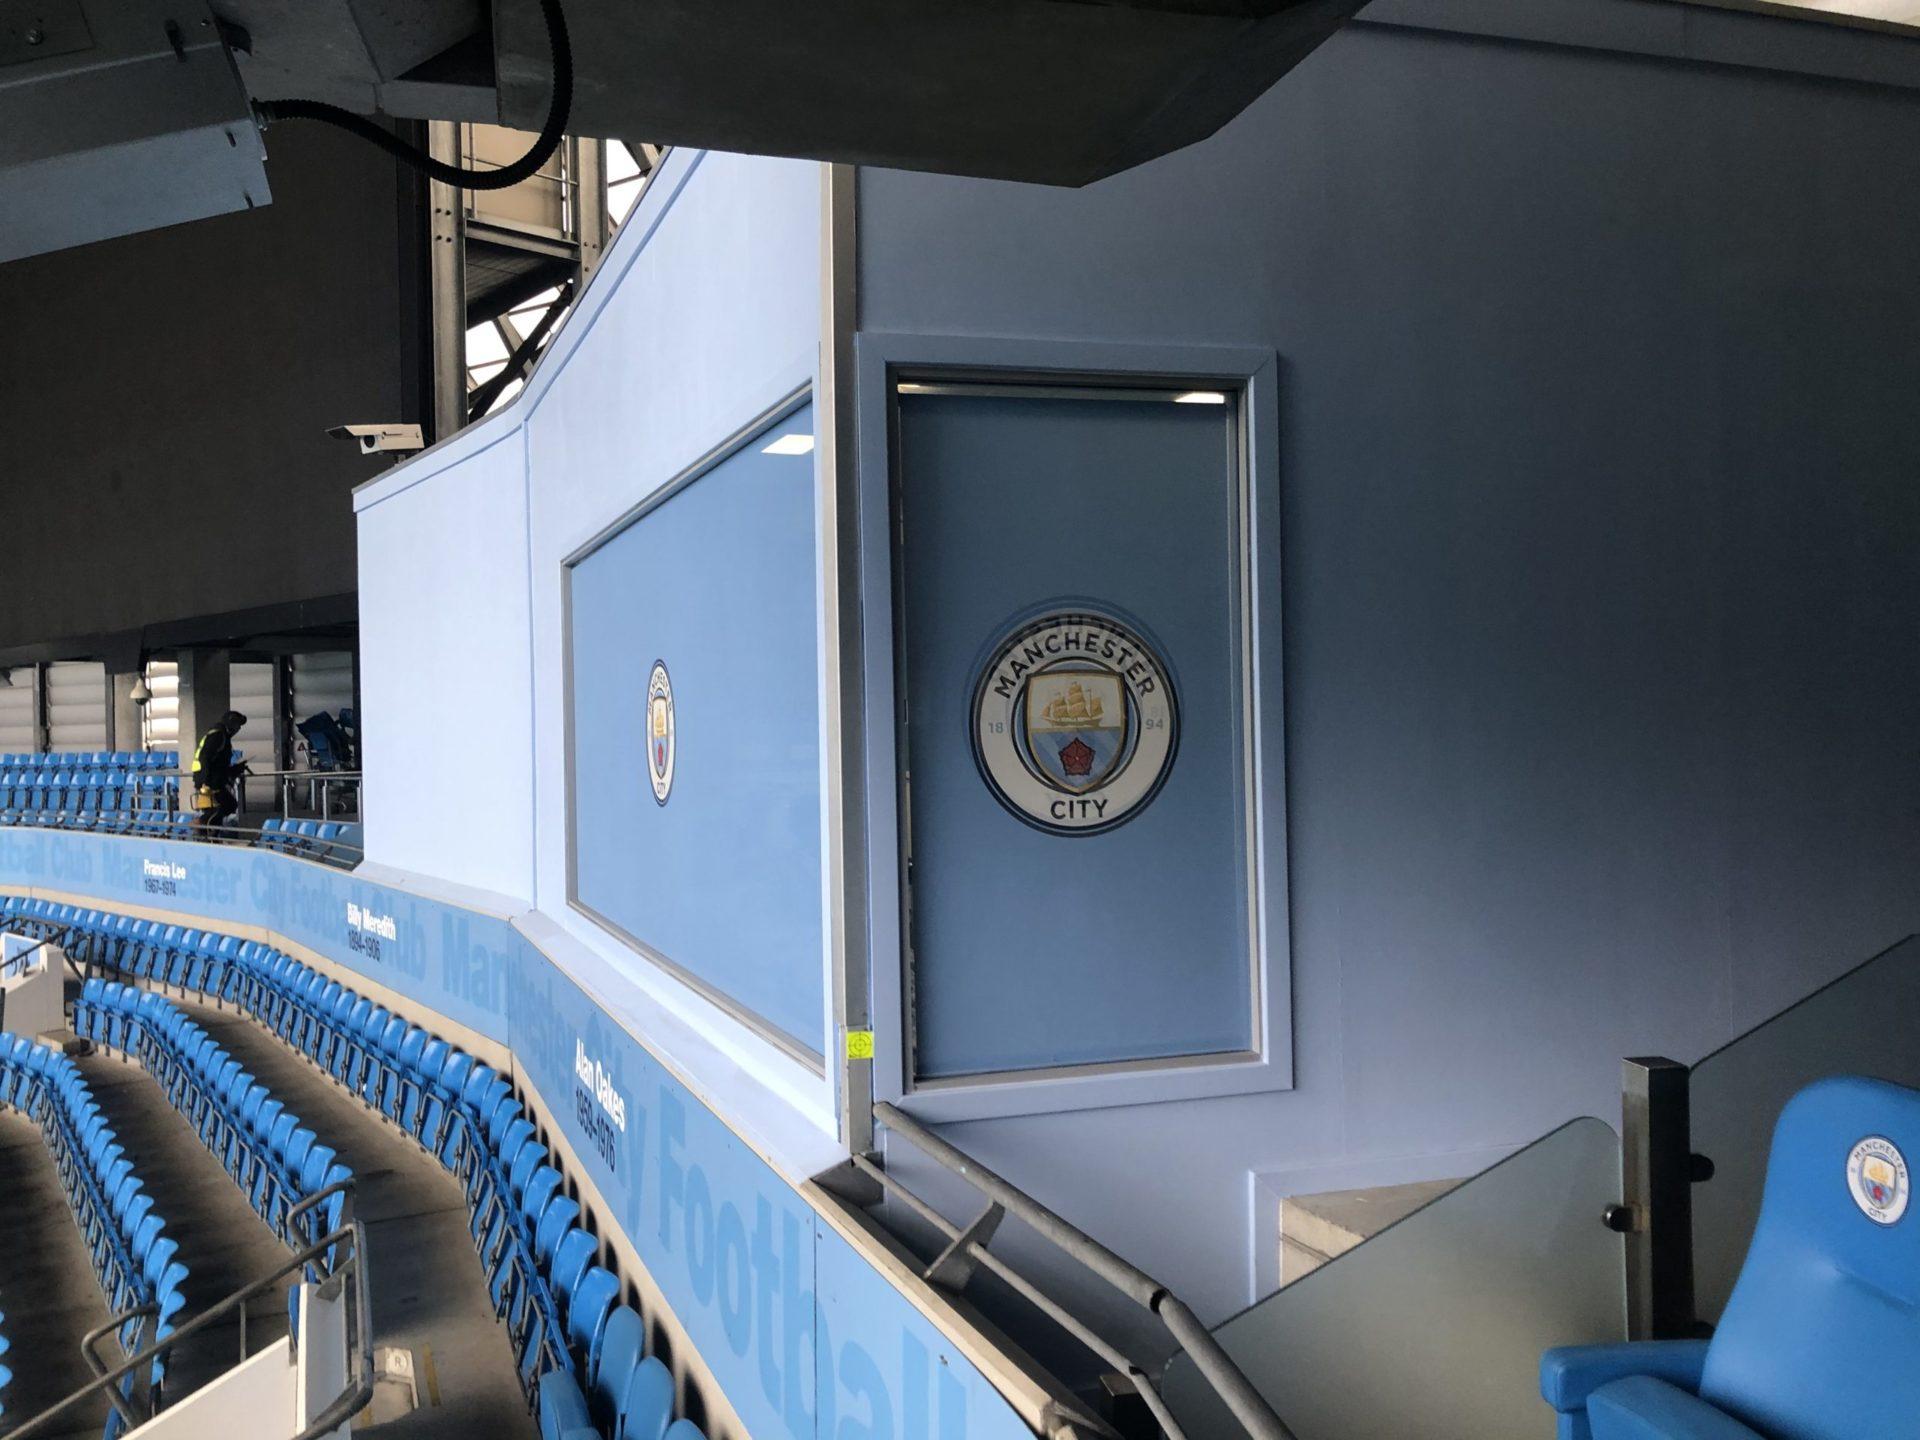 manchester-city-arena-executive-box-window-wrap-contra-vision